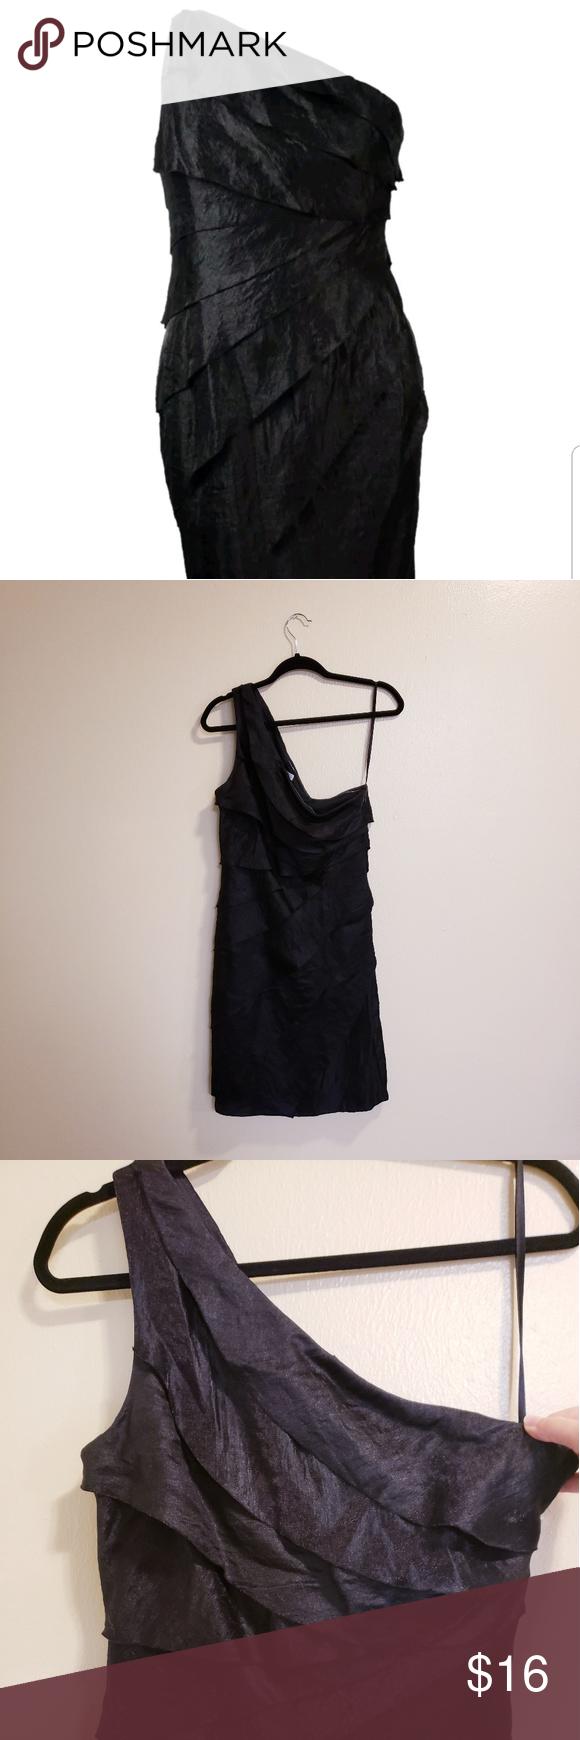 London Times Black Tiered One Shoulder Dress Preloved London Times